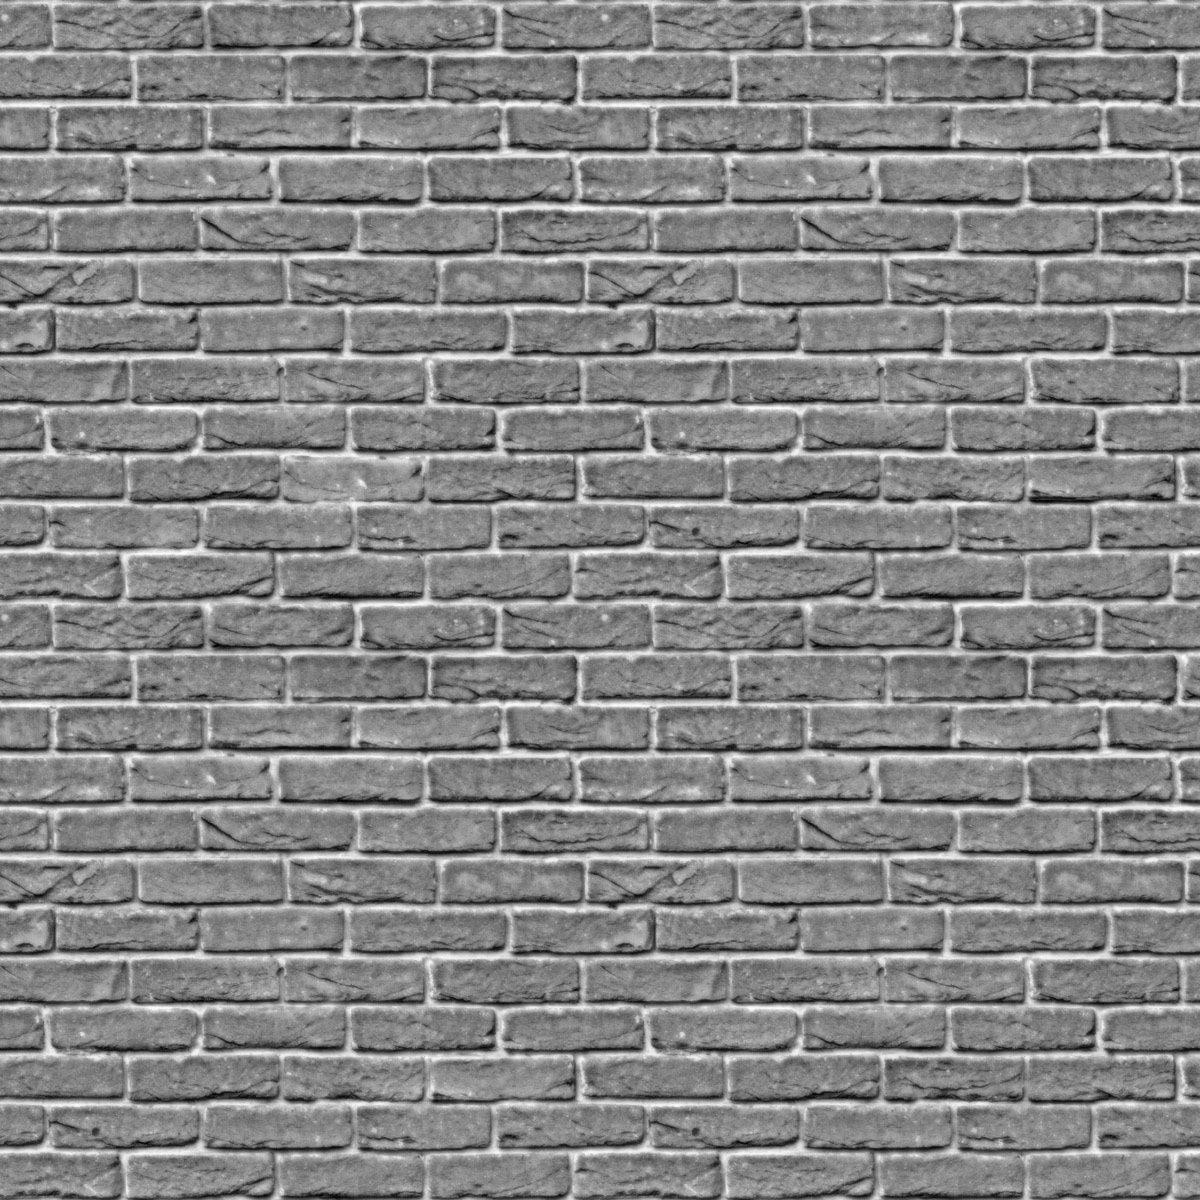 Seamless Red Brick Texture Maps Texturise Brick Texture Texture Brick